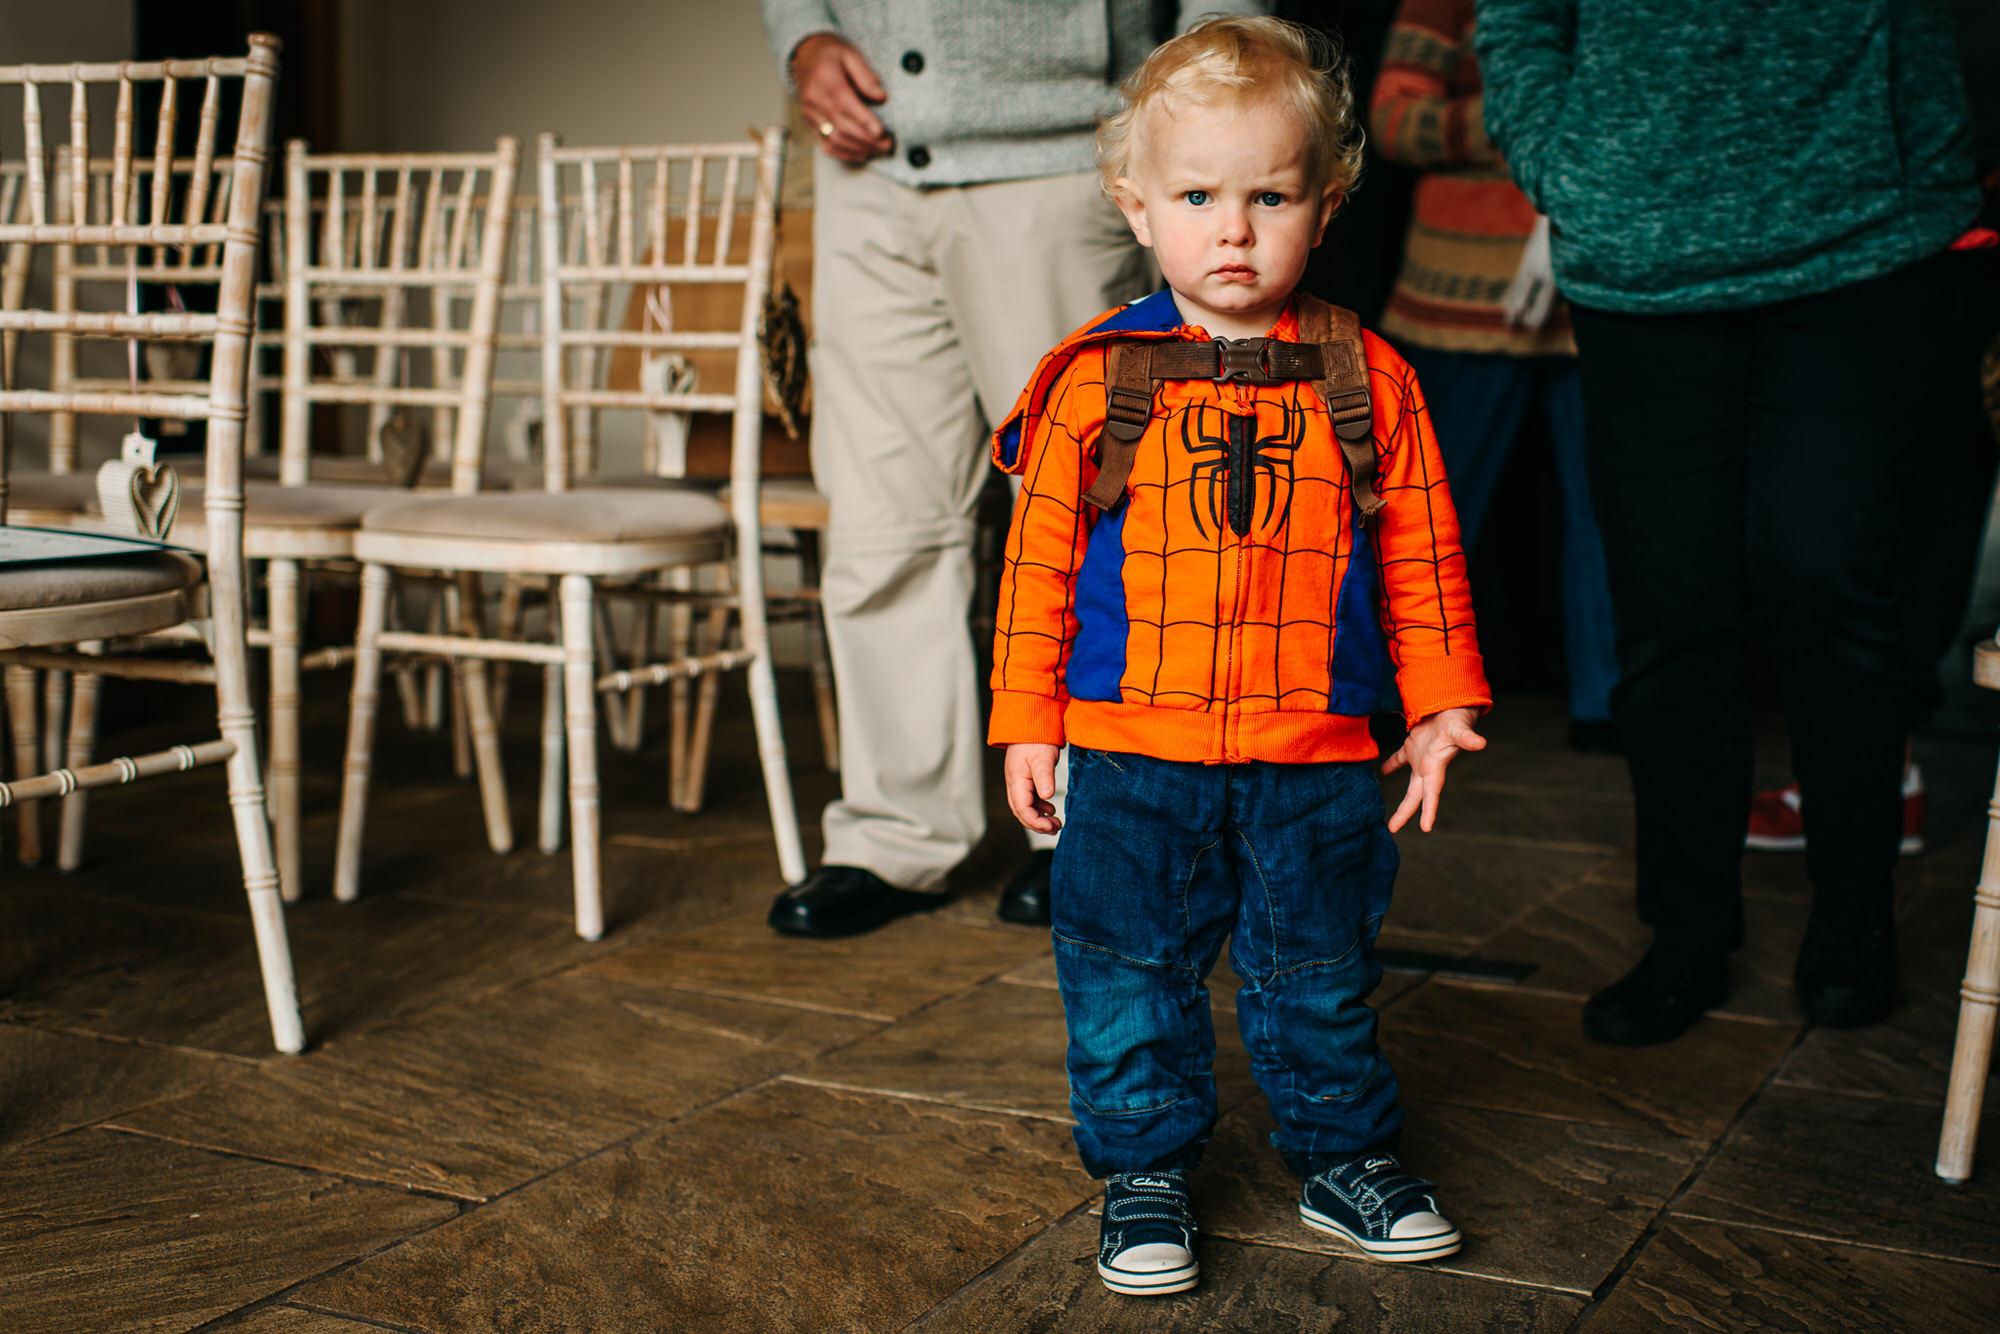 Best Of Yorkshire Wedding Photography 2017 - Martyn Hand-64.jpg